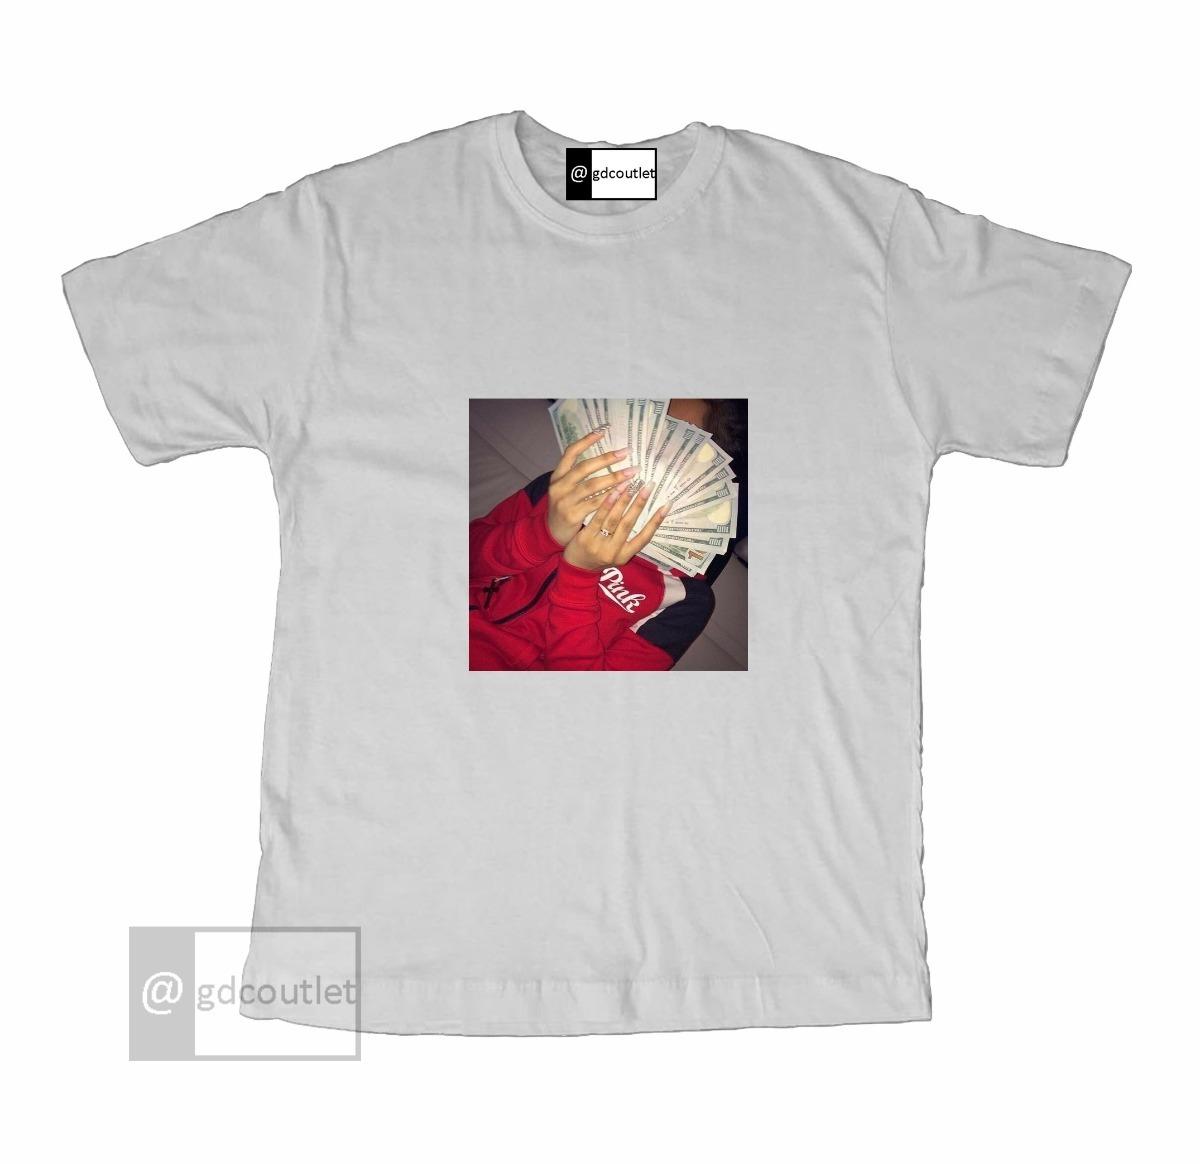 camisa camiseta money girls swag skate nike pronta entrega. Carregando zoom. 43164fa7f7ef0